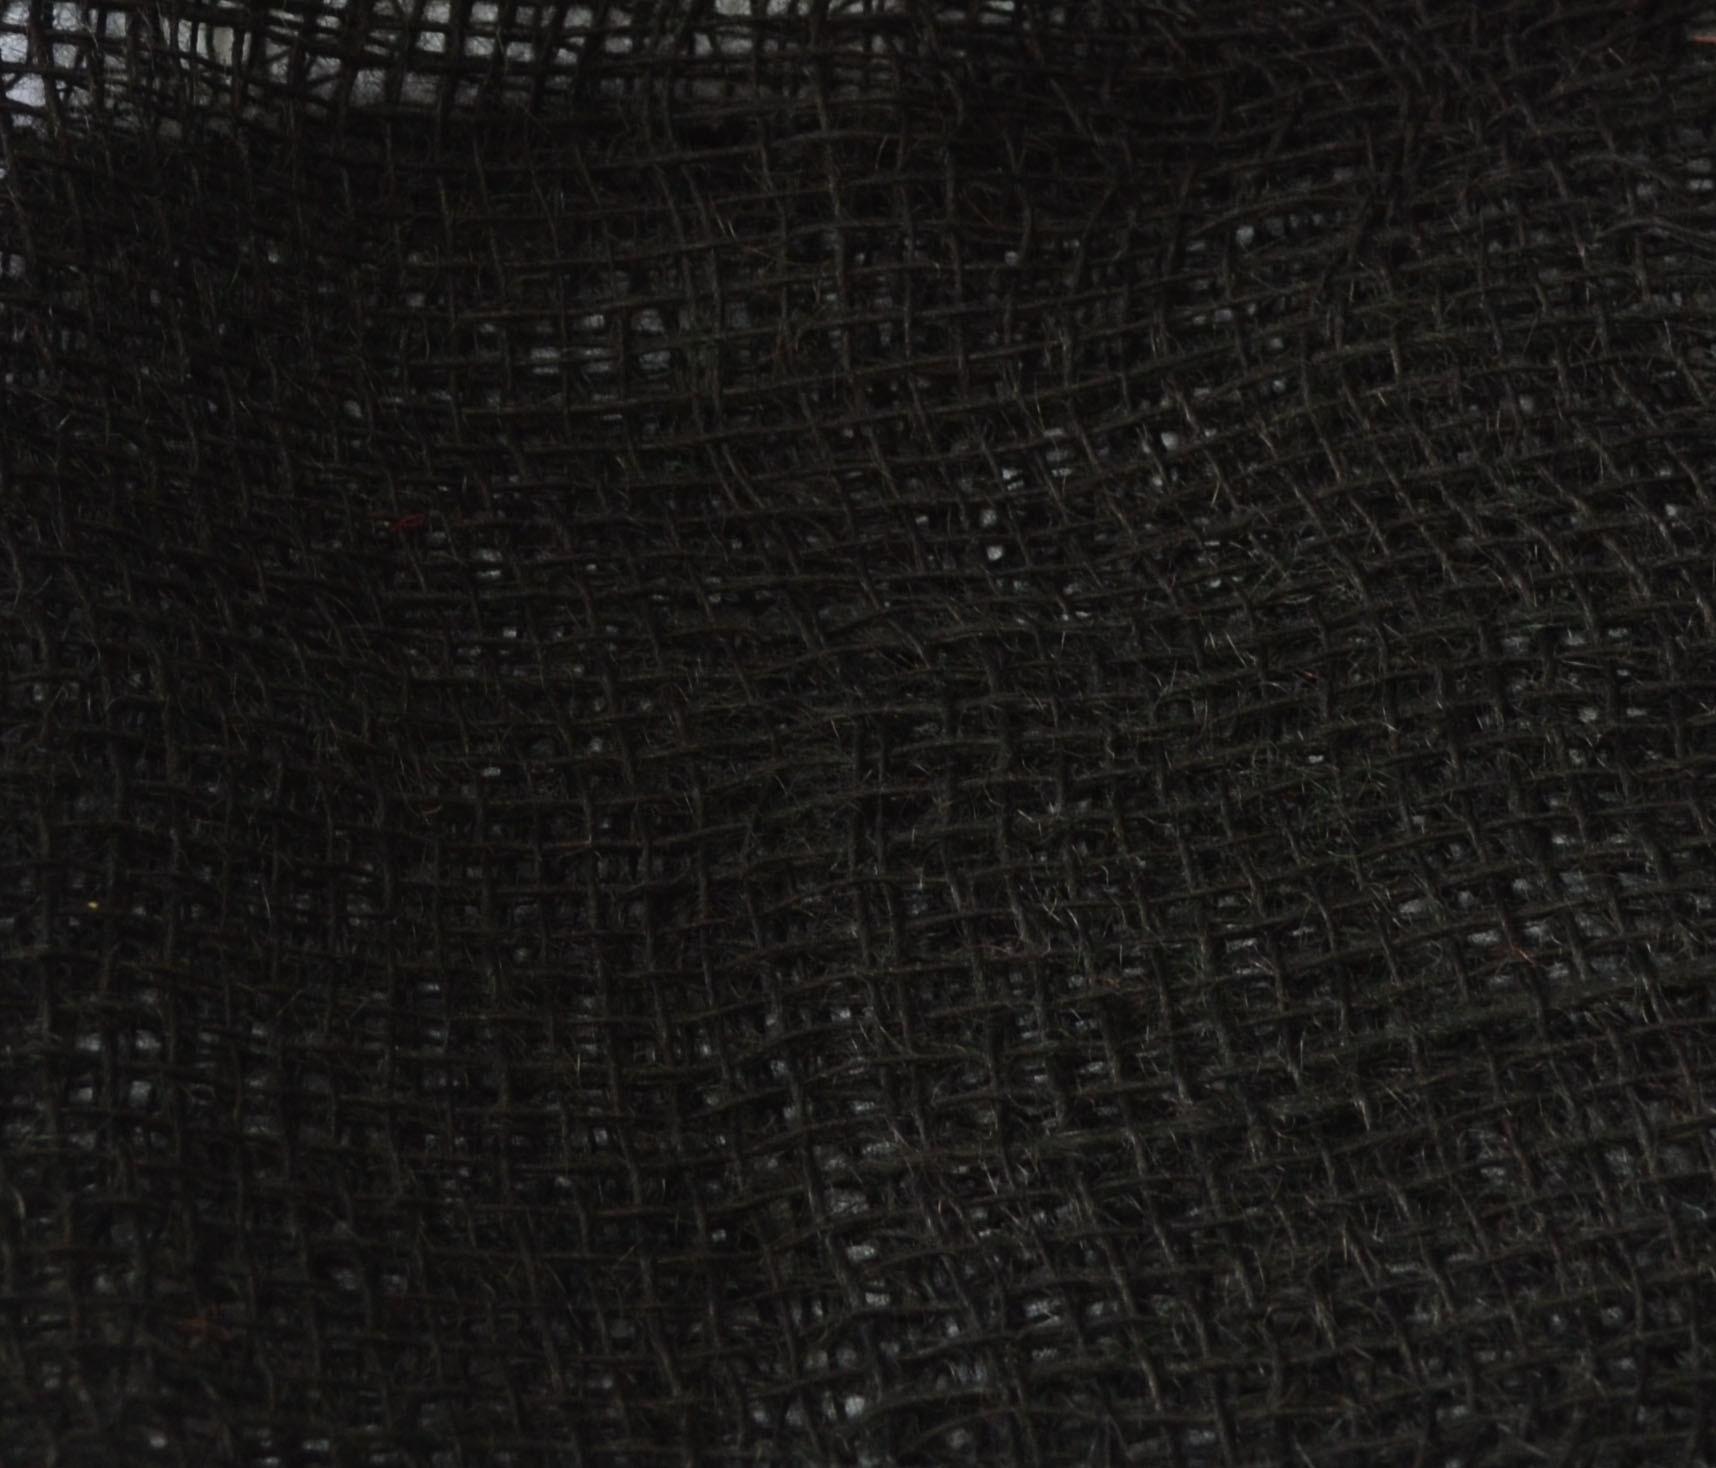 Tela de Juta 145 - Trama Aberta - Preto (cor 320)